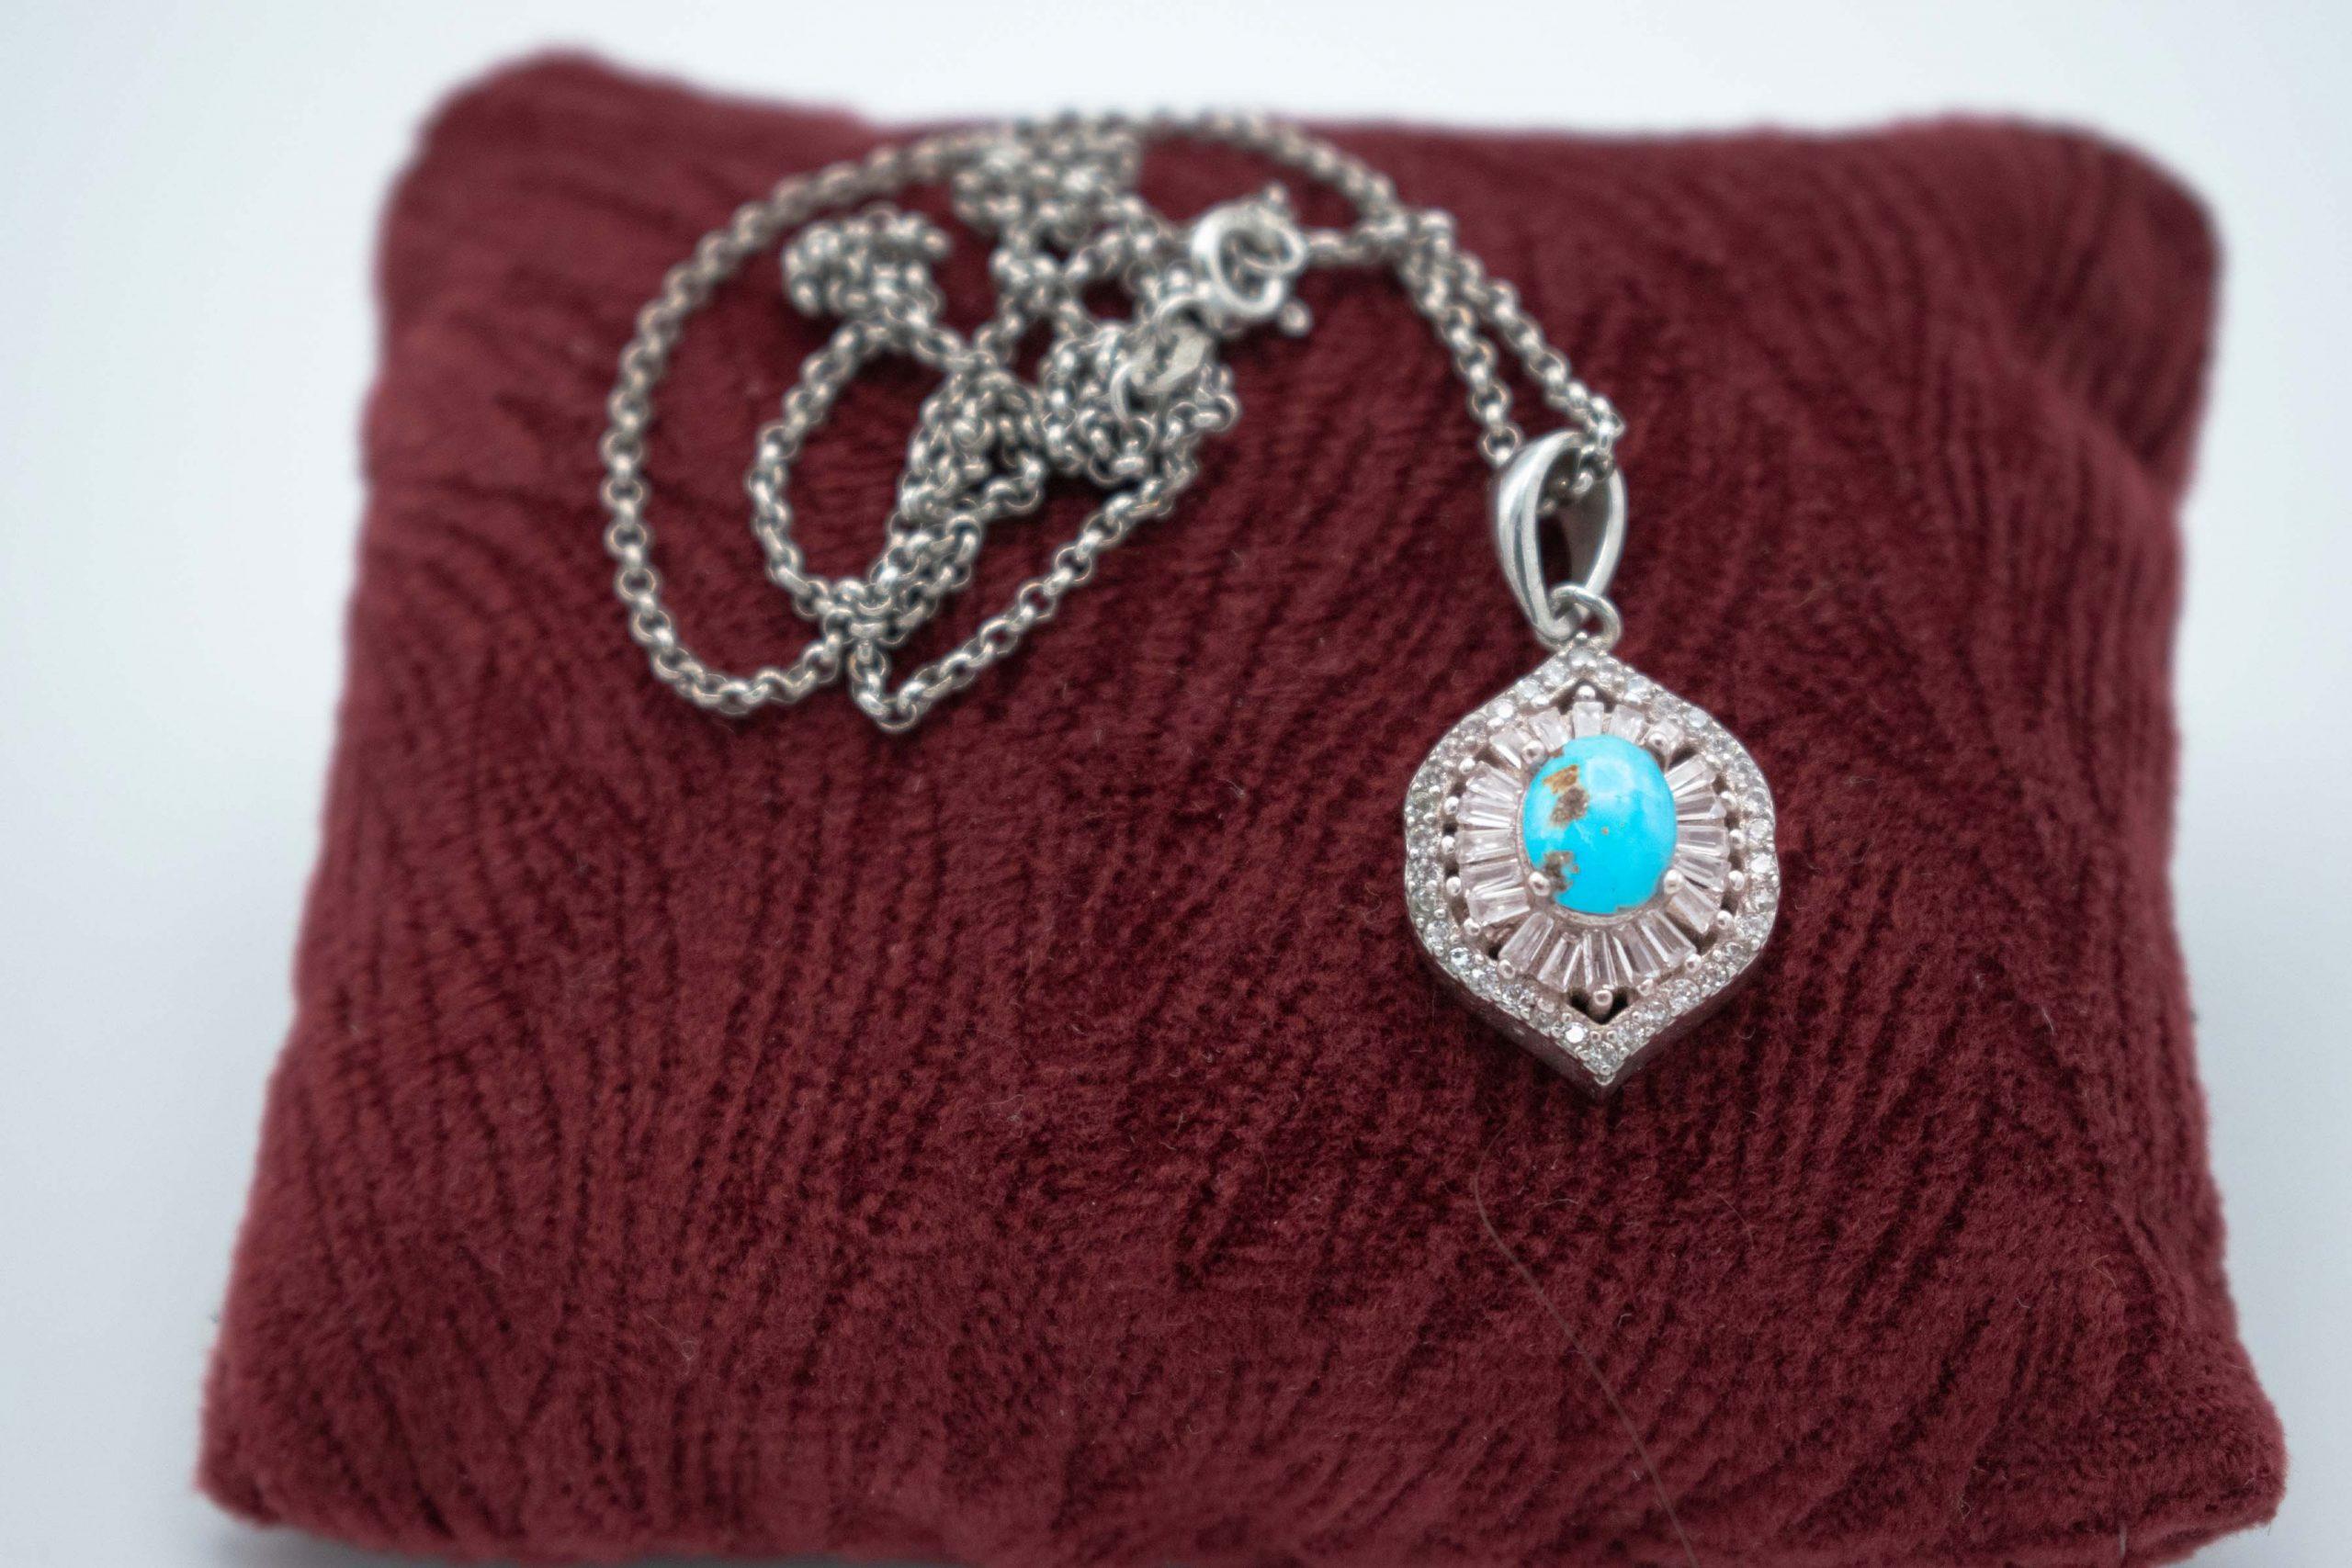 Persian Turquoise / Silver Jewellery Set - Eye